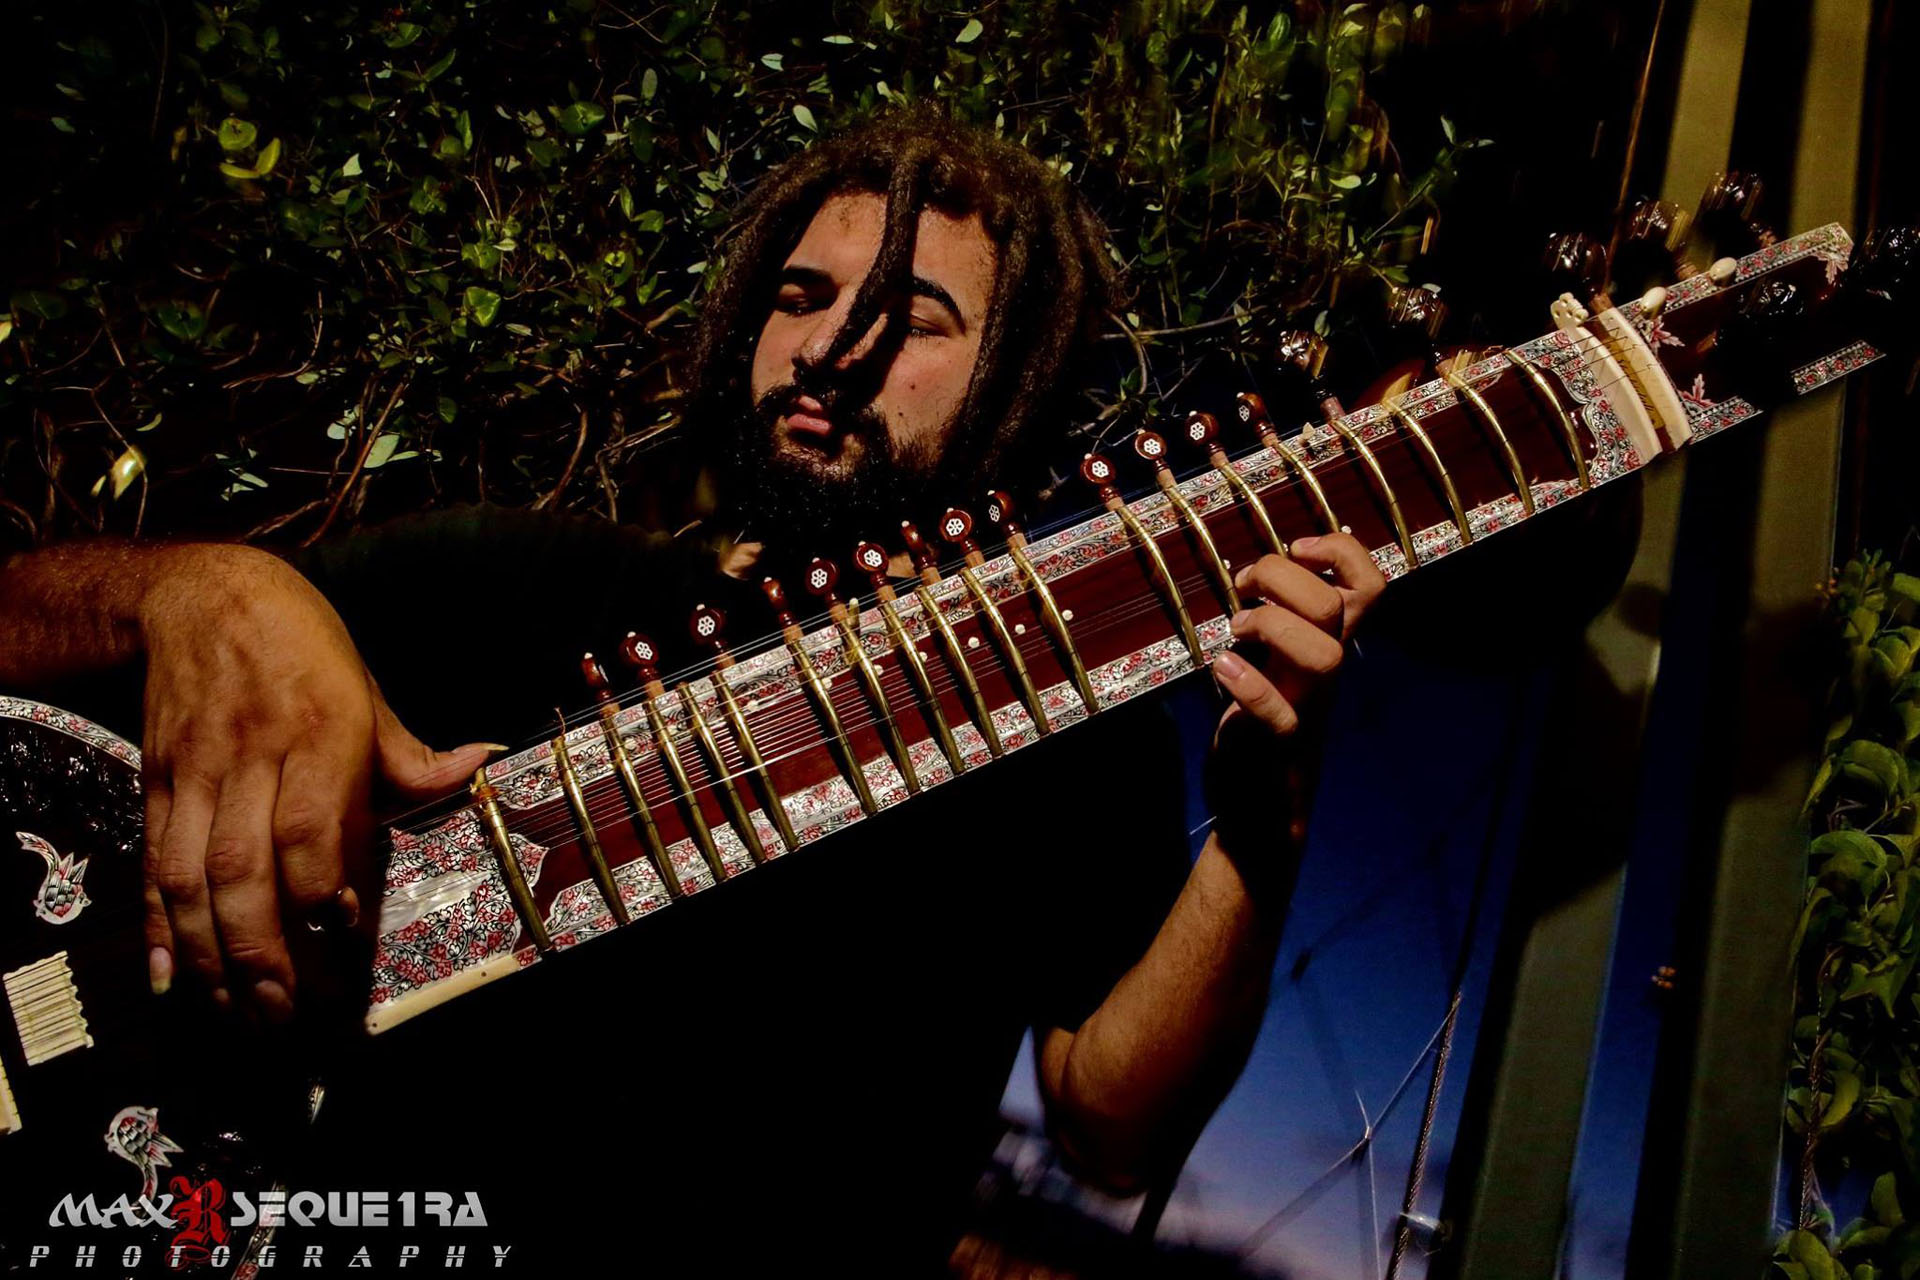 Photo Credit: Max R. Sequeira